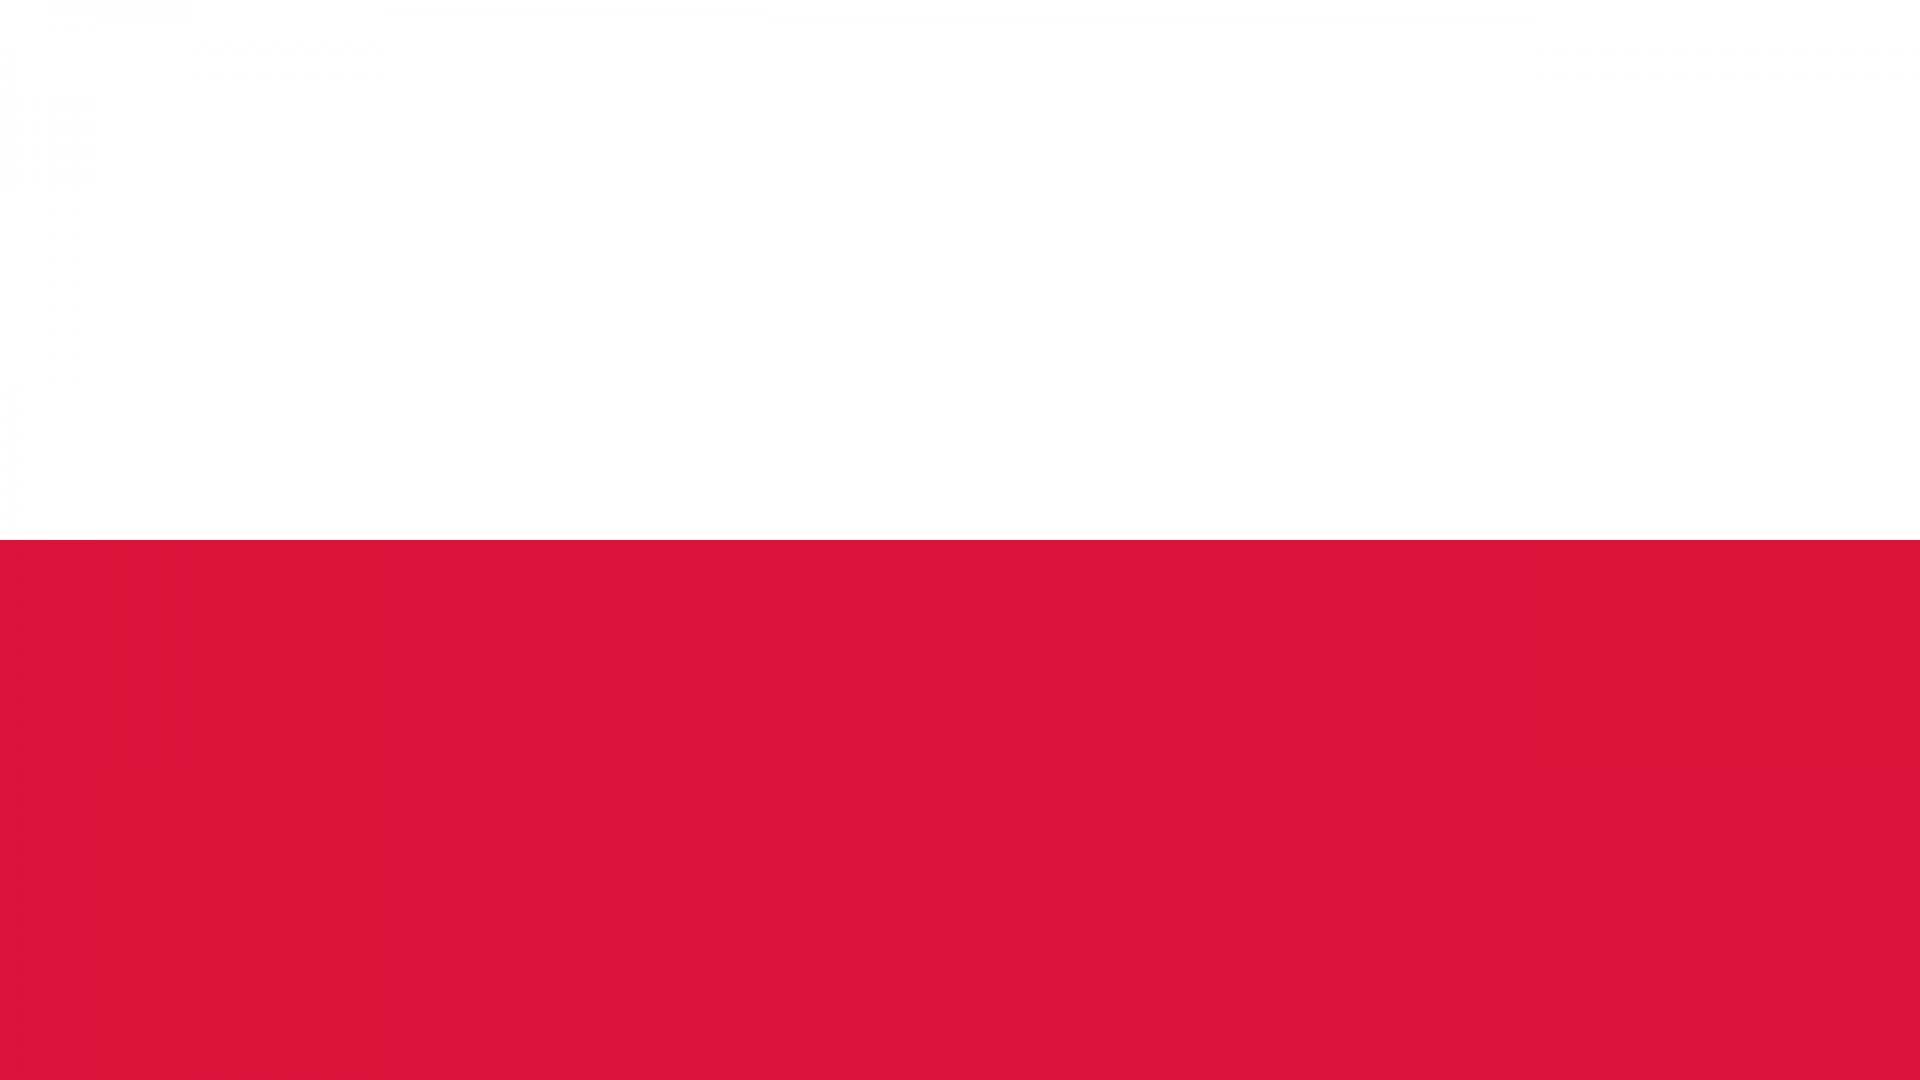 Poland Flag   Wallpaper High Definition High Quality Widescreen 1920x1080